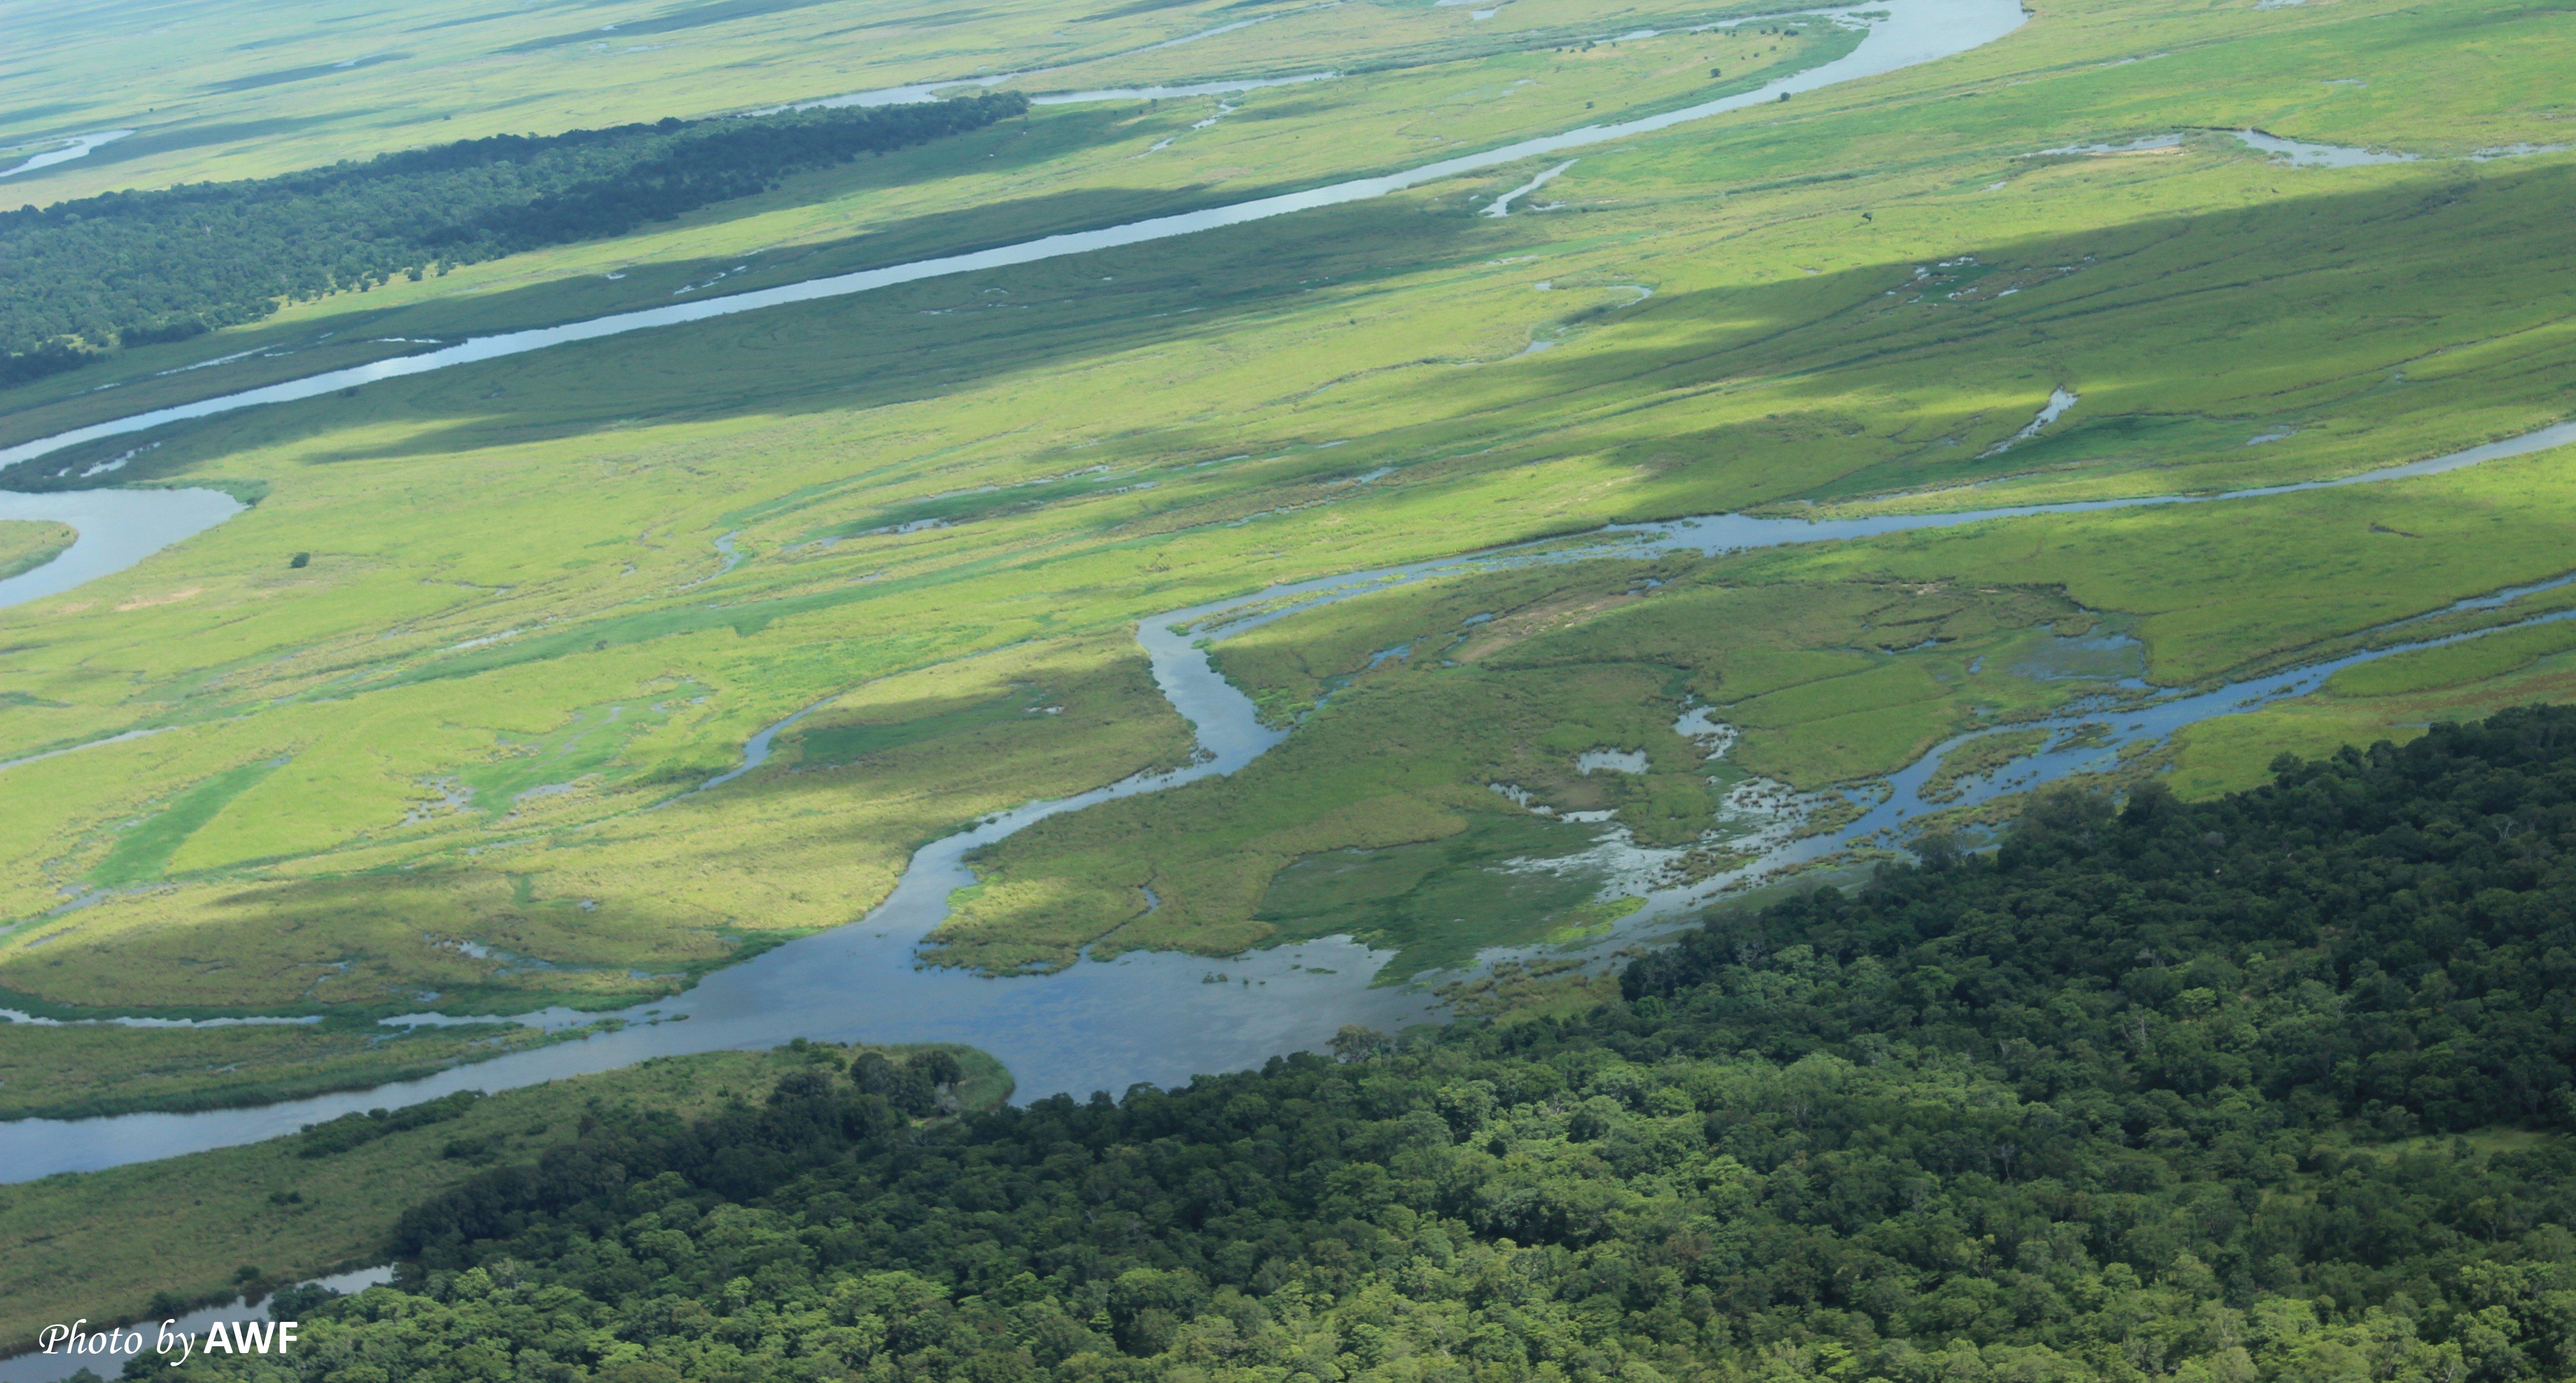 Kilombero landscape